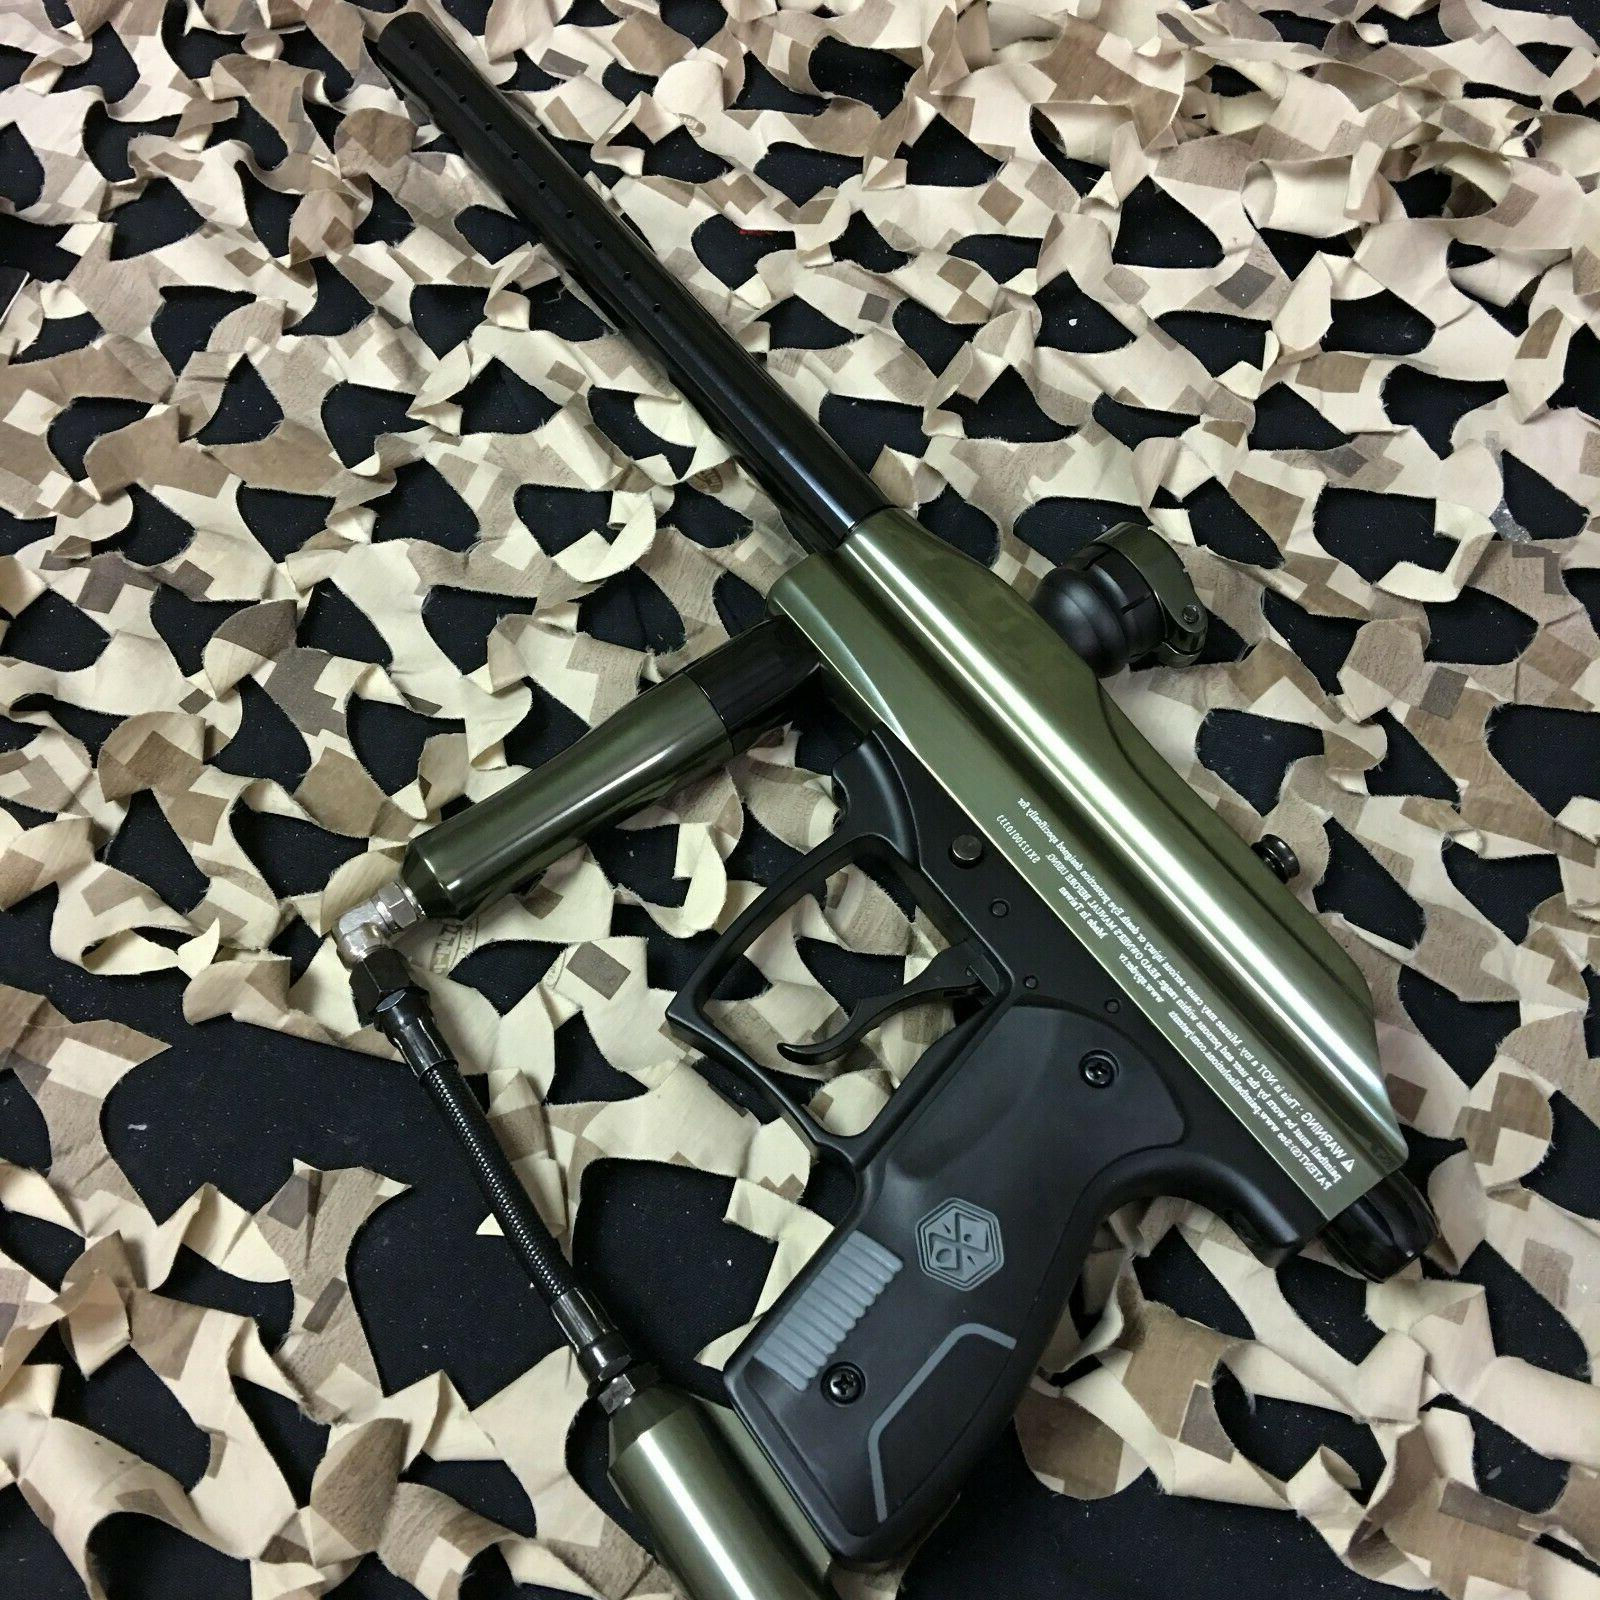 NEW KINGMAN SPYDER XTRA SEMI-AUTO PAINTBALL GUN/Marker GLOSS